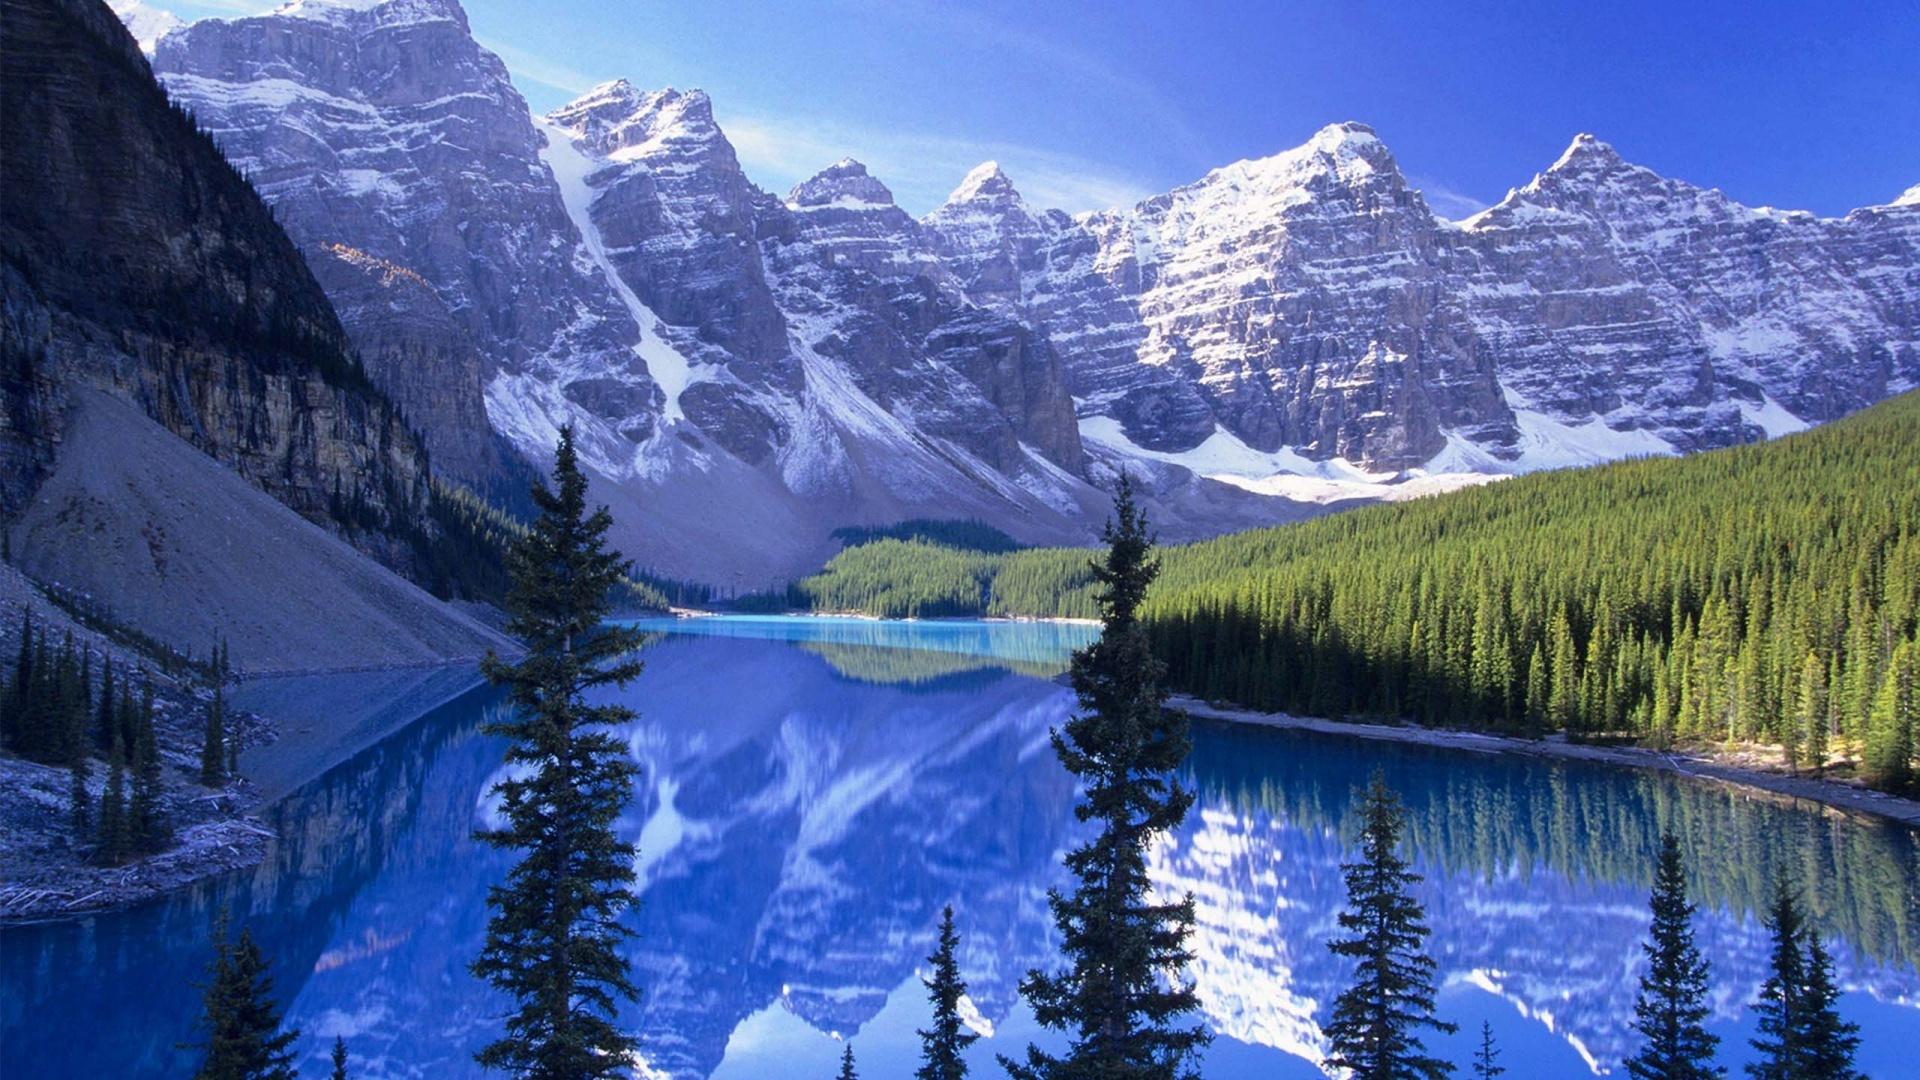 Blue Lake And Mountains 壁紙画像 Pchdwallpaper Com Pchdwallpaper Com